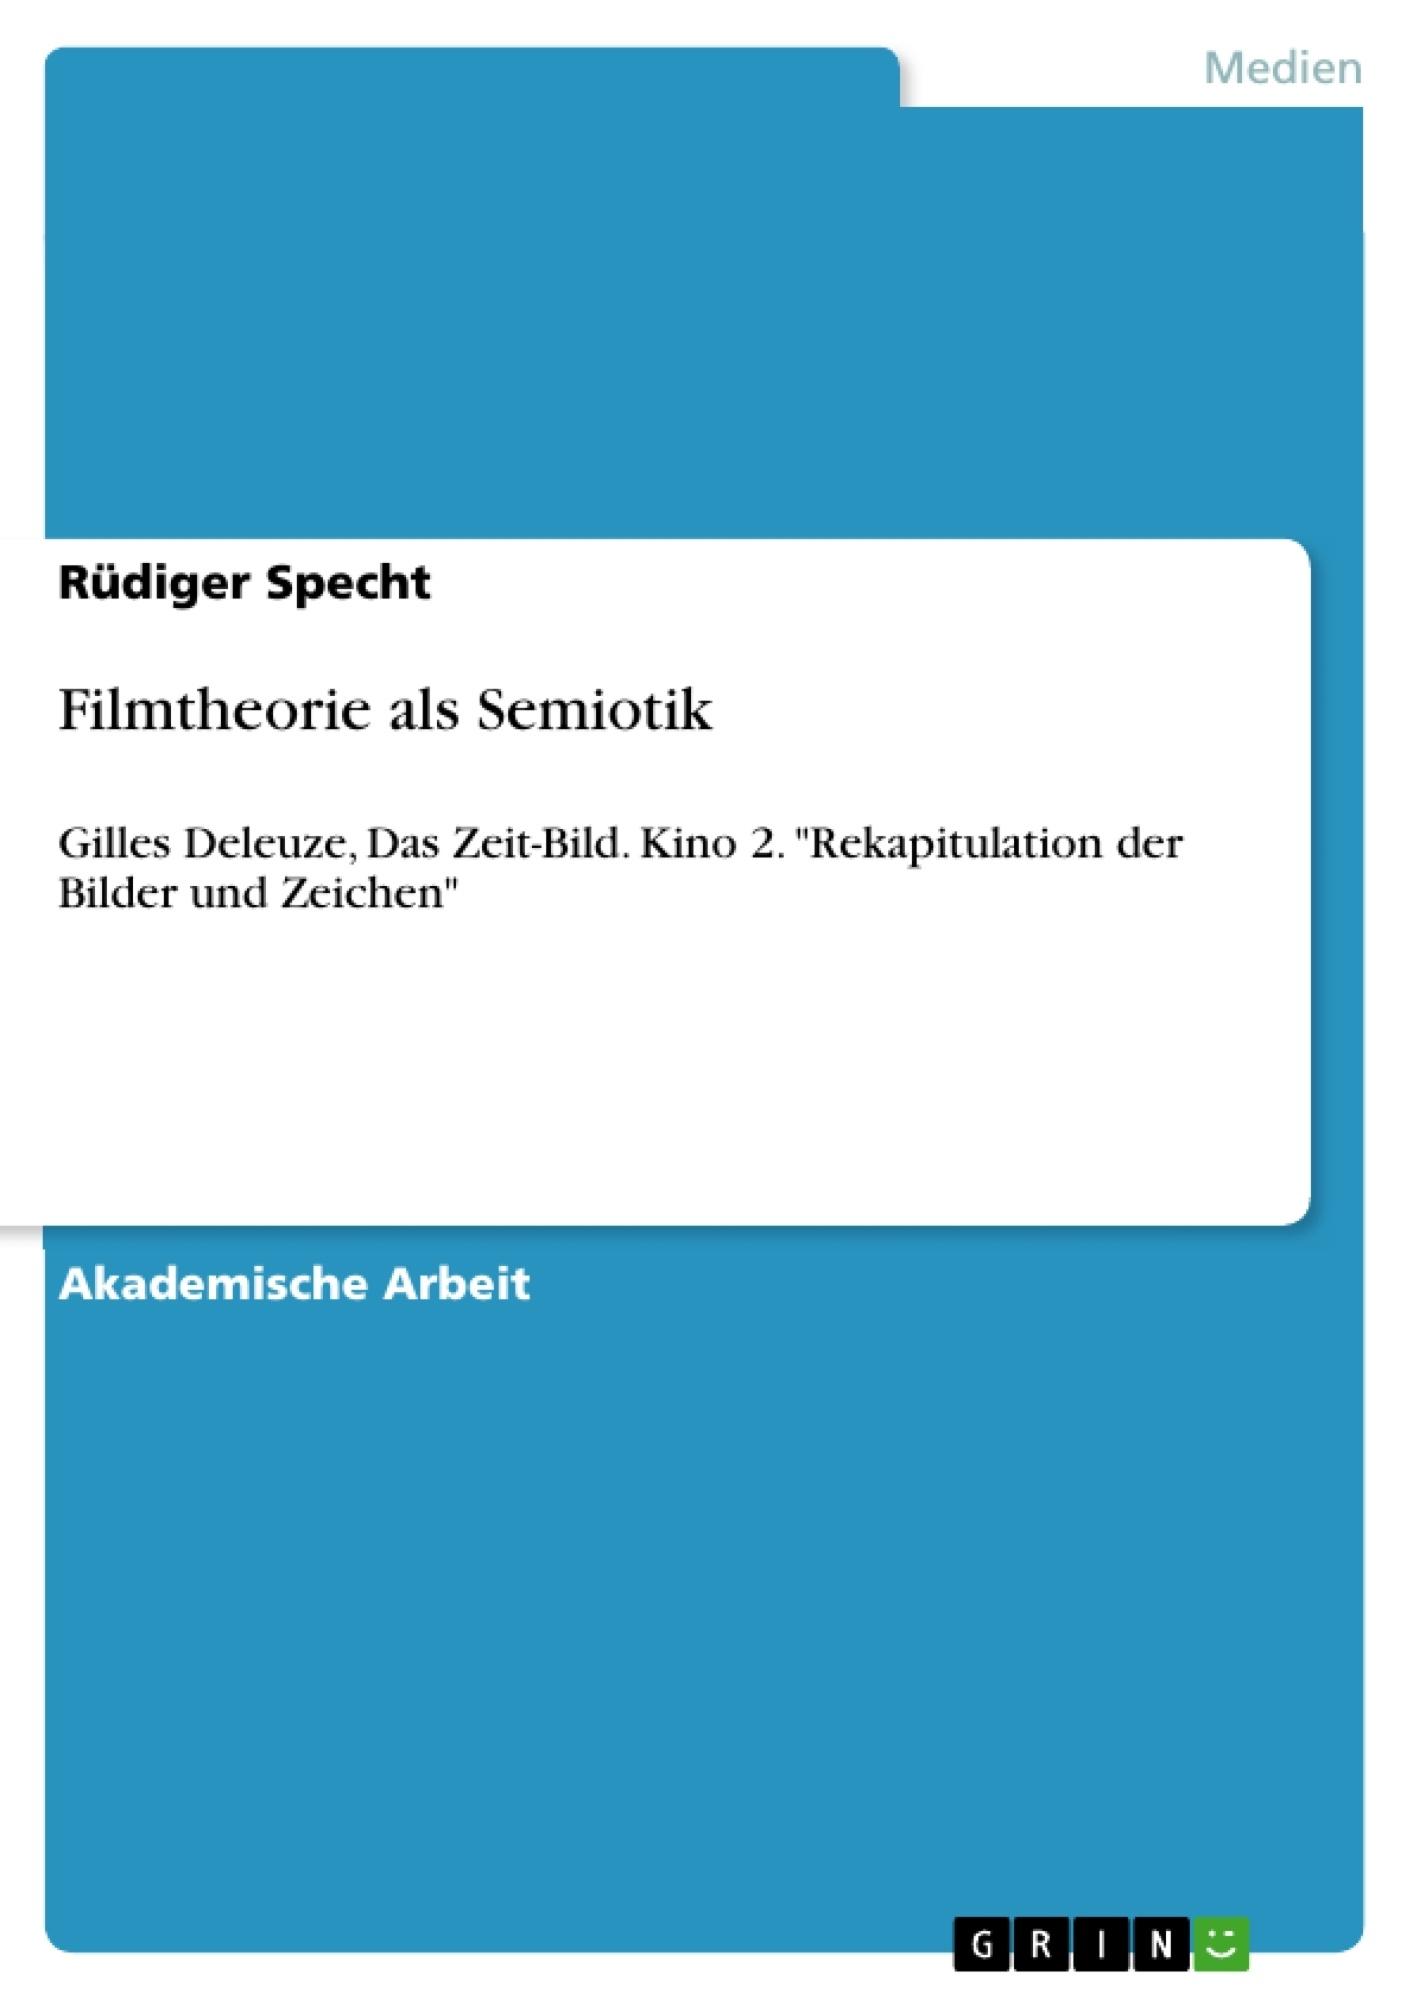 Titel: Filmtheorie als Semiotik